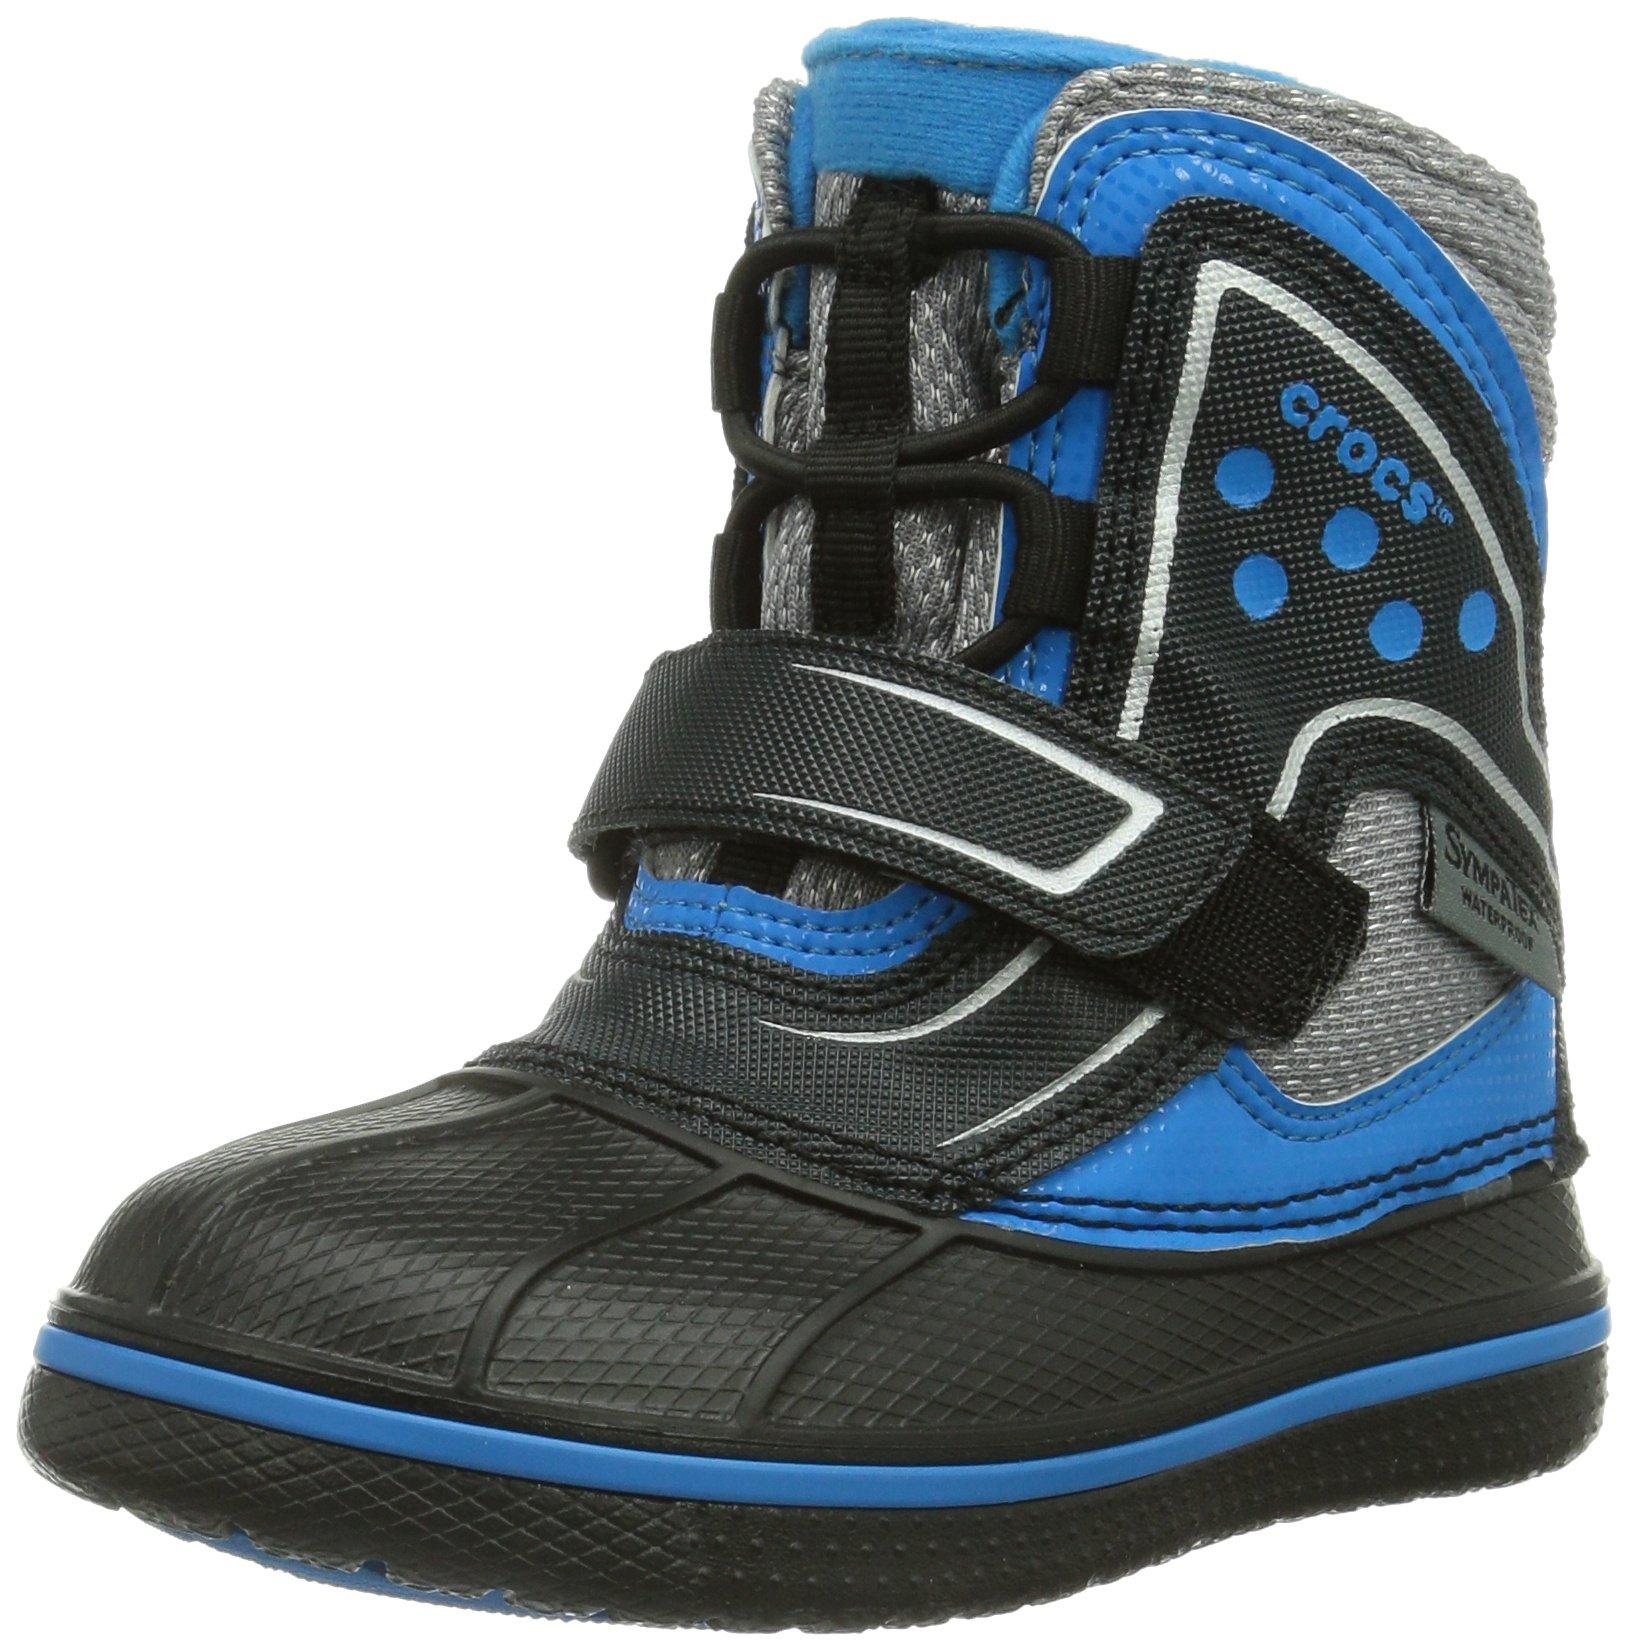 crocs AllCast Waterproof Snow Boot (Toddler/Little Kid/Big Kid), Black/Ocean, 9 M US Toddler